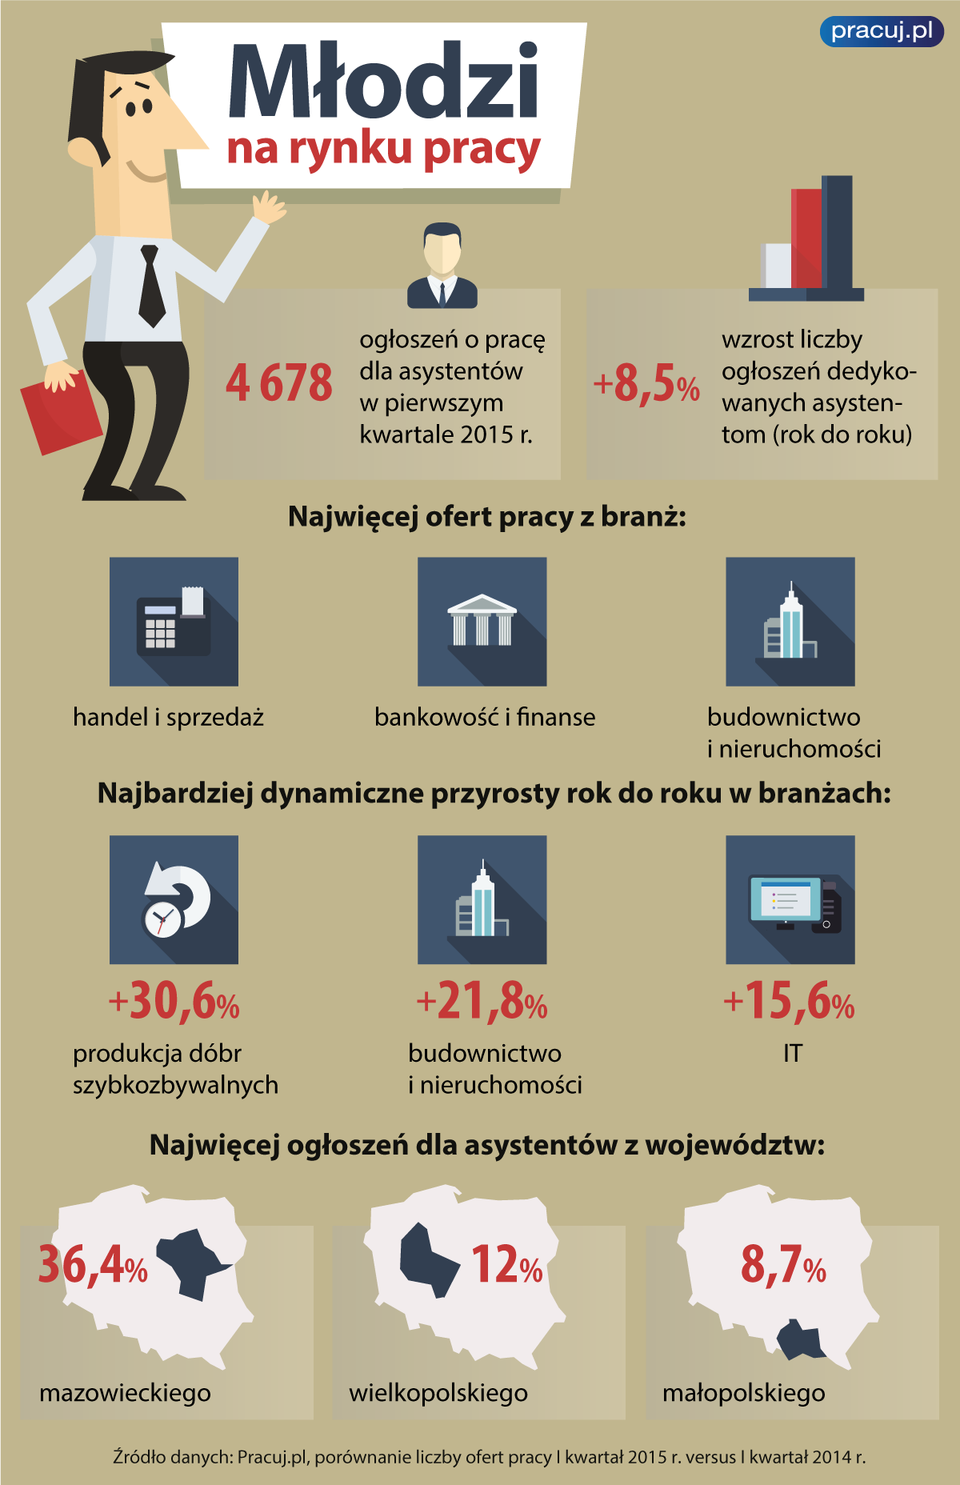 rynek_mlodzi.png